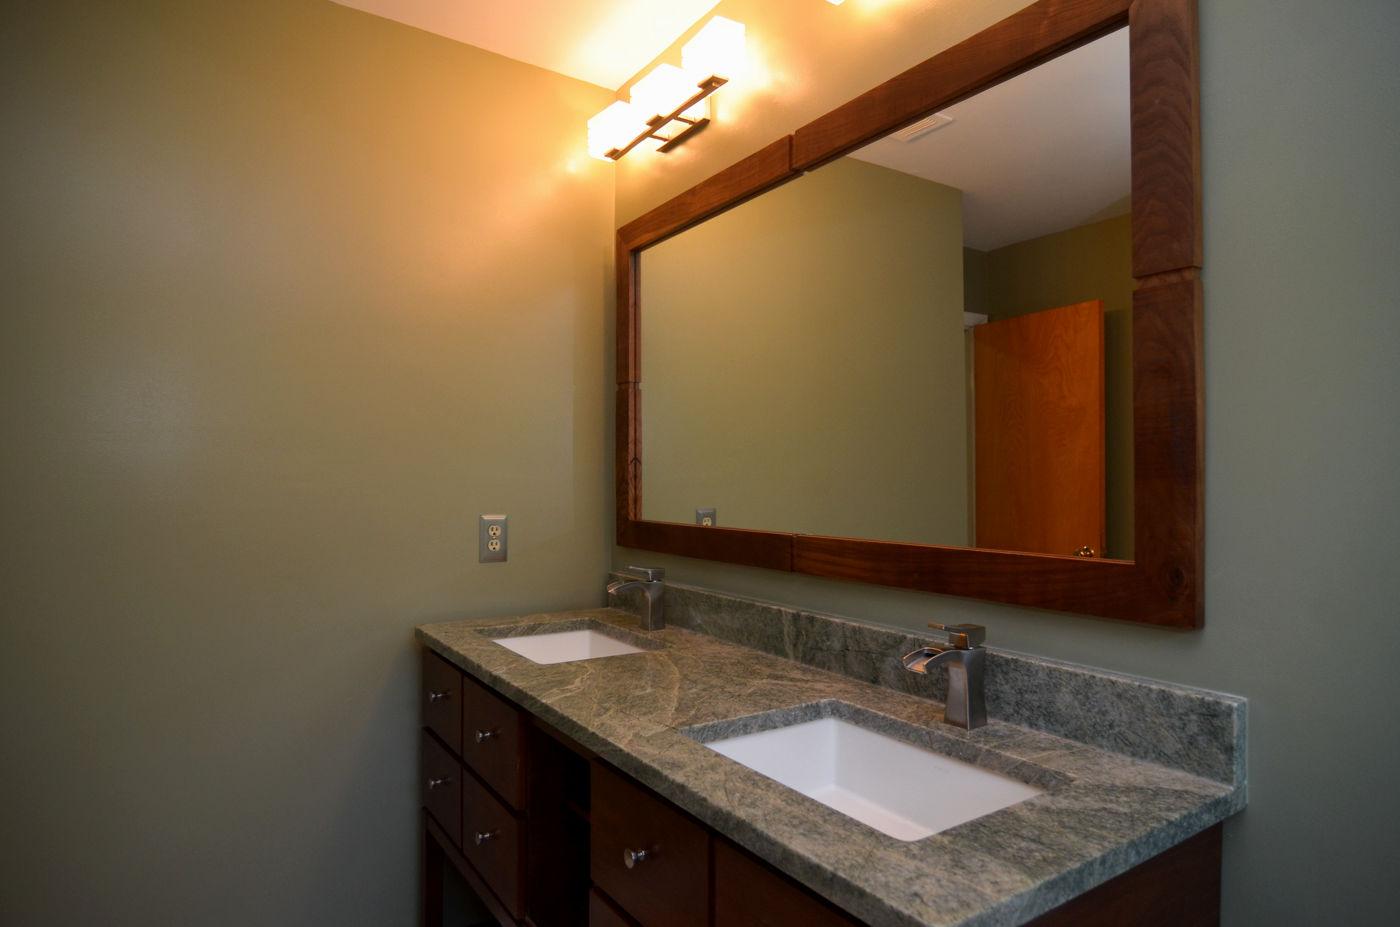 fresh lowes bathroom vanity with sink layout-Luxury Lowes Bathroom Vanity with Sink Online